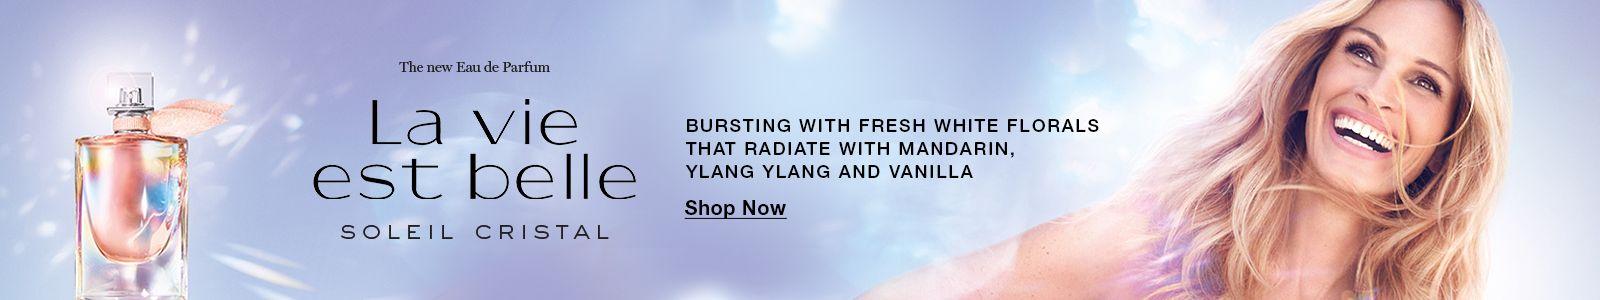 The new Eau de Parfum, La Vie est belle, Soleil Cristal, Bursting With Fresh White Florals That Radiate With Mandarin, Ylang Ylang and Vanilla, Shop Now